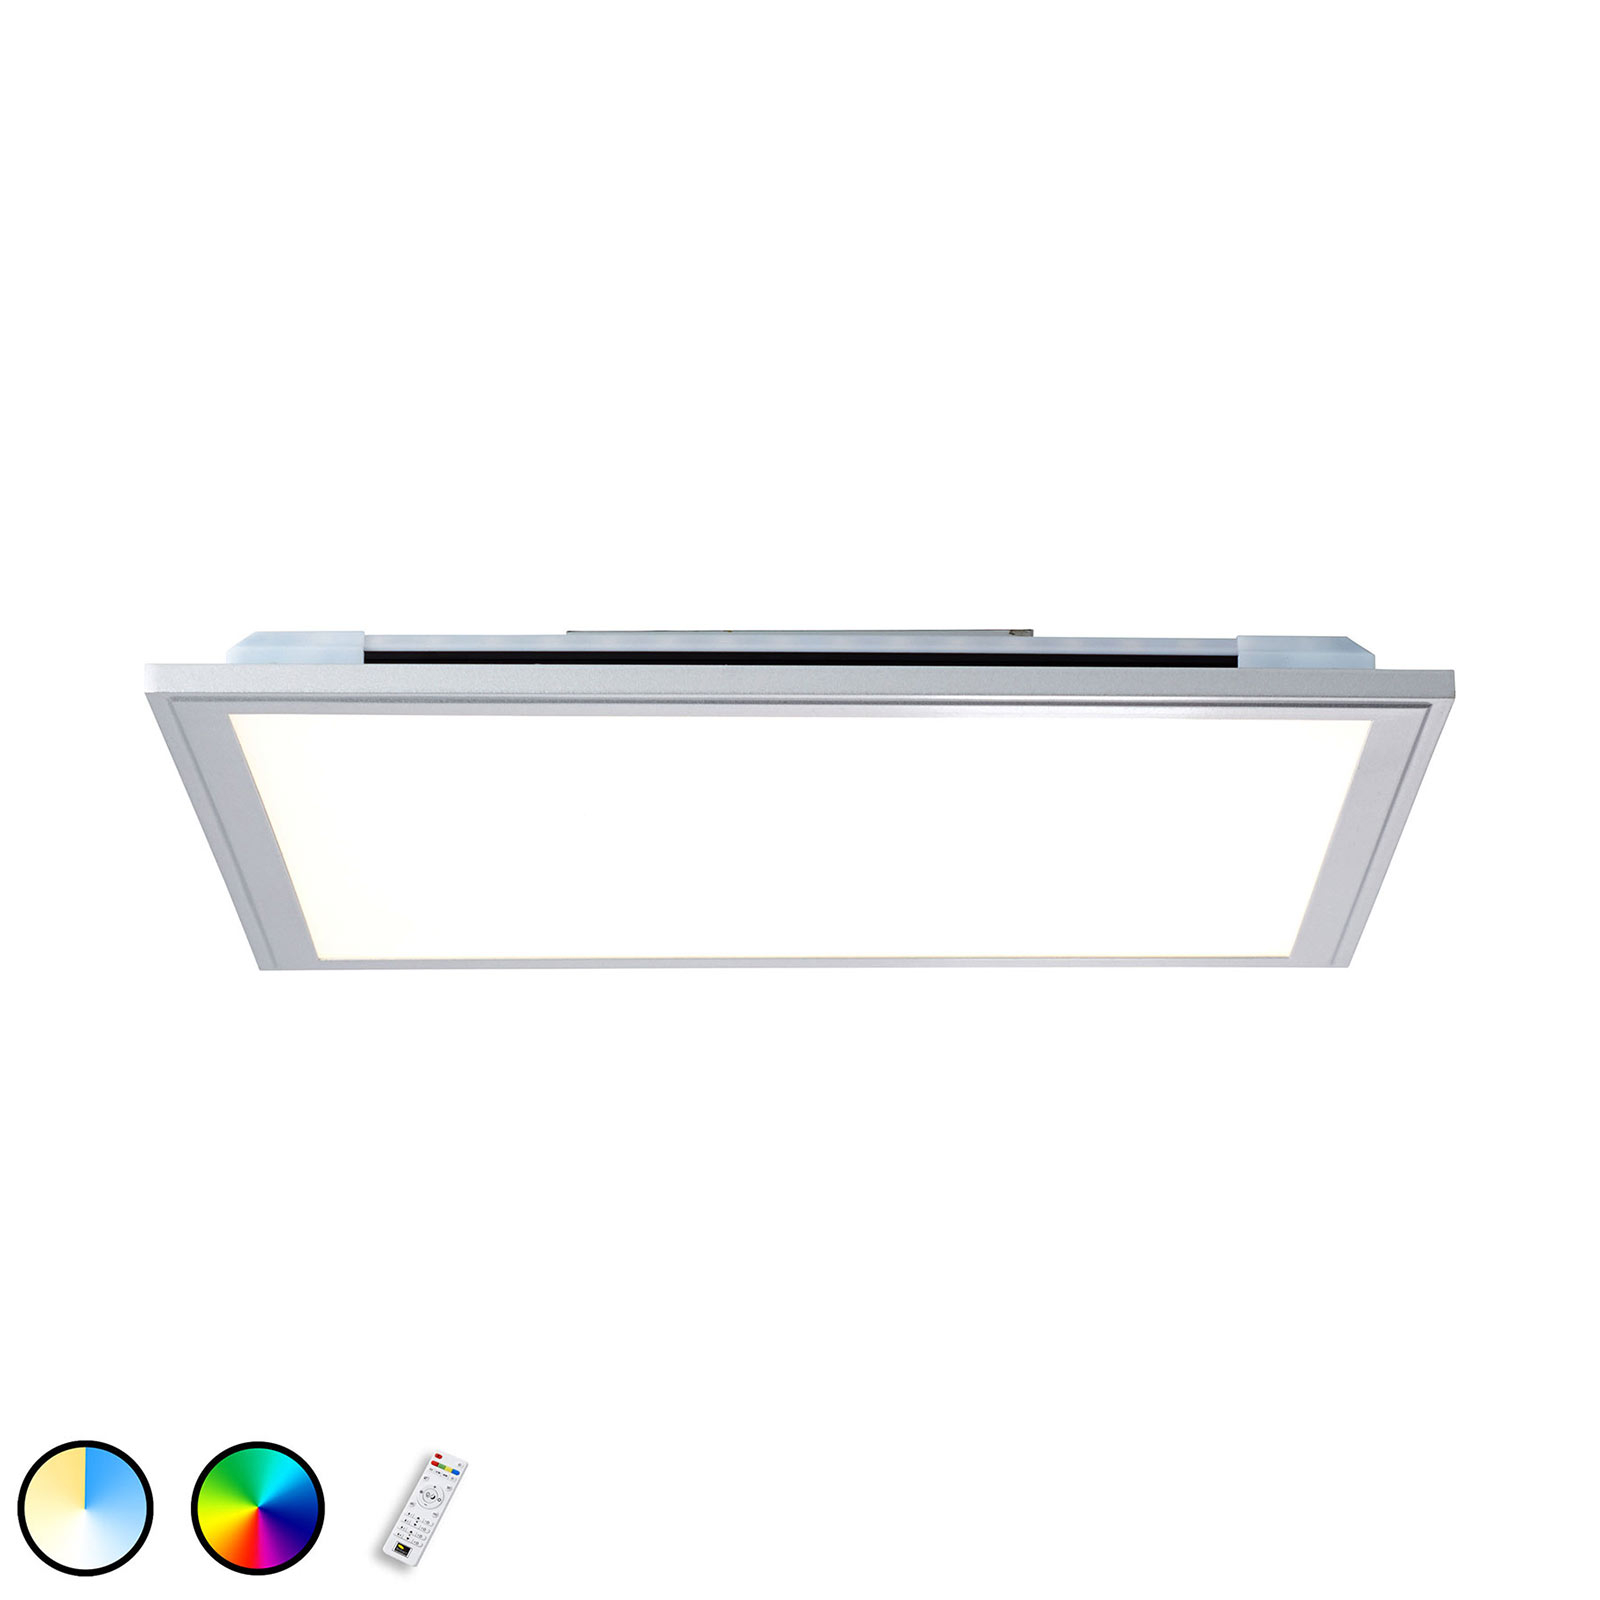 LED-taklampe Alissa, 39,5x39,5 cm